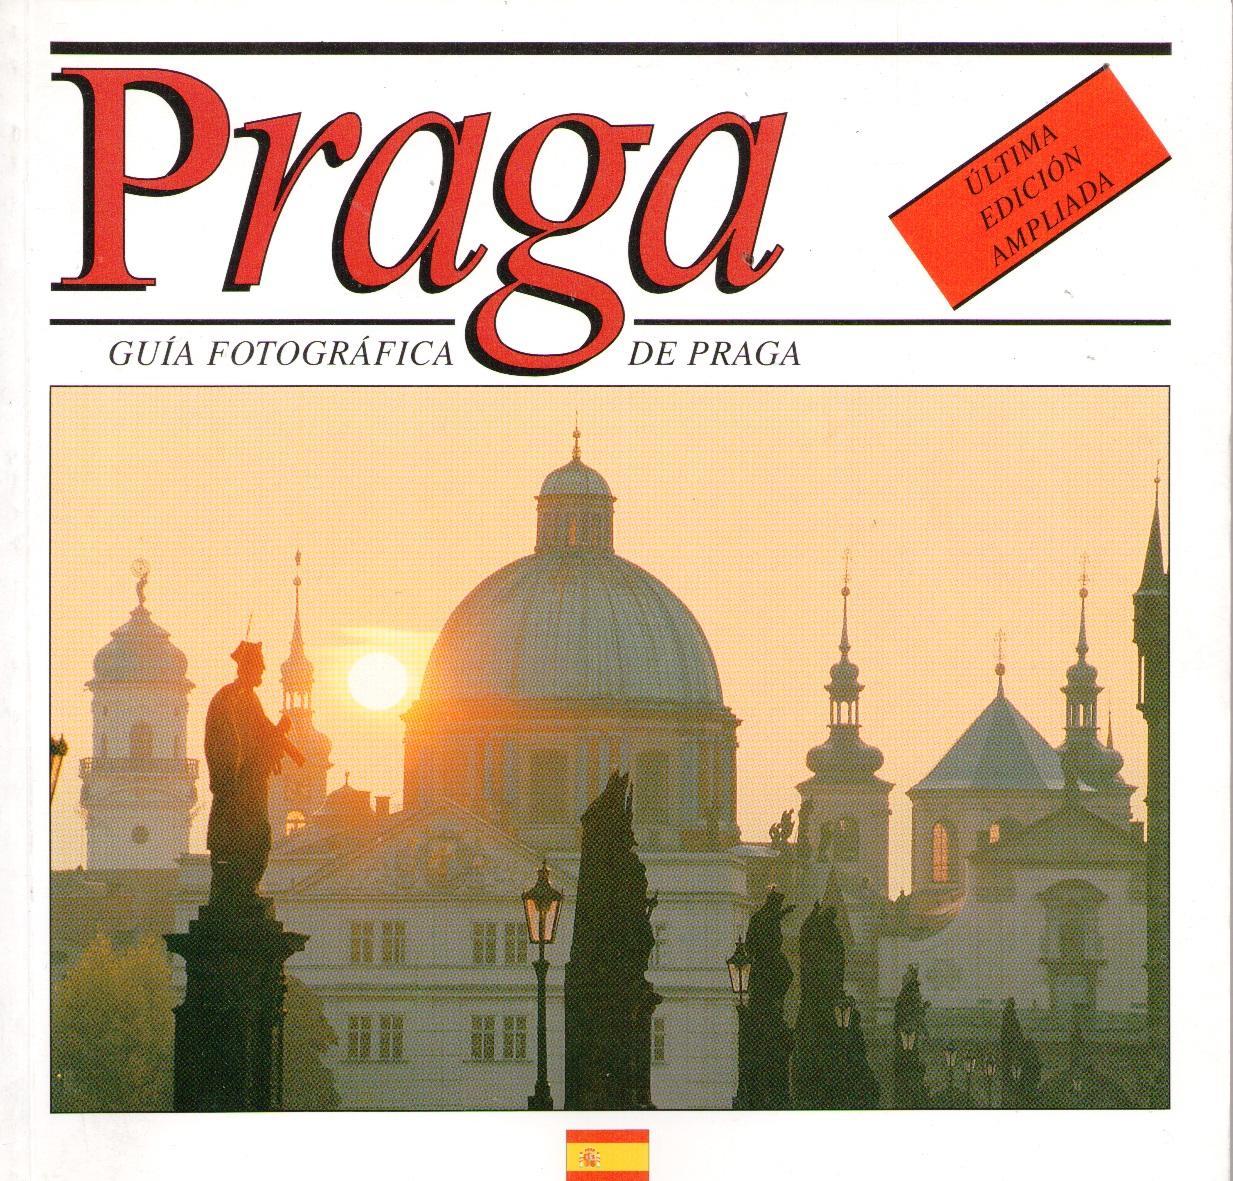 PRAGA. GUÍA FOTOGRÁFICA DE PRAGA - HANA BILKOVÁ